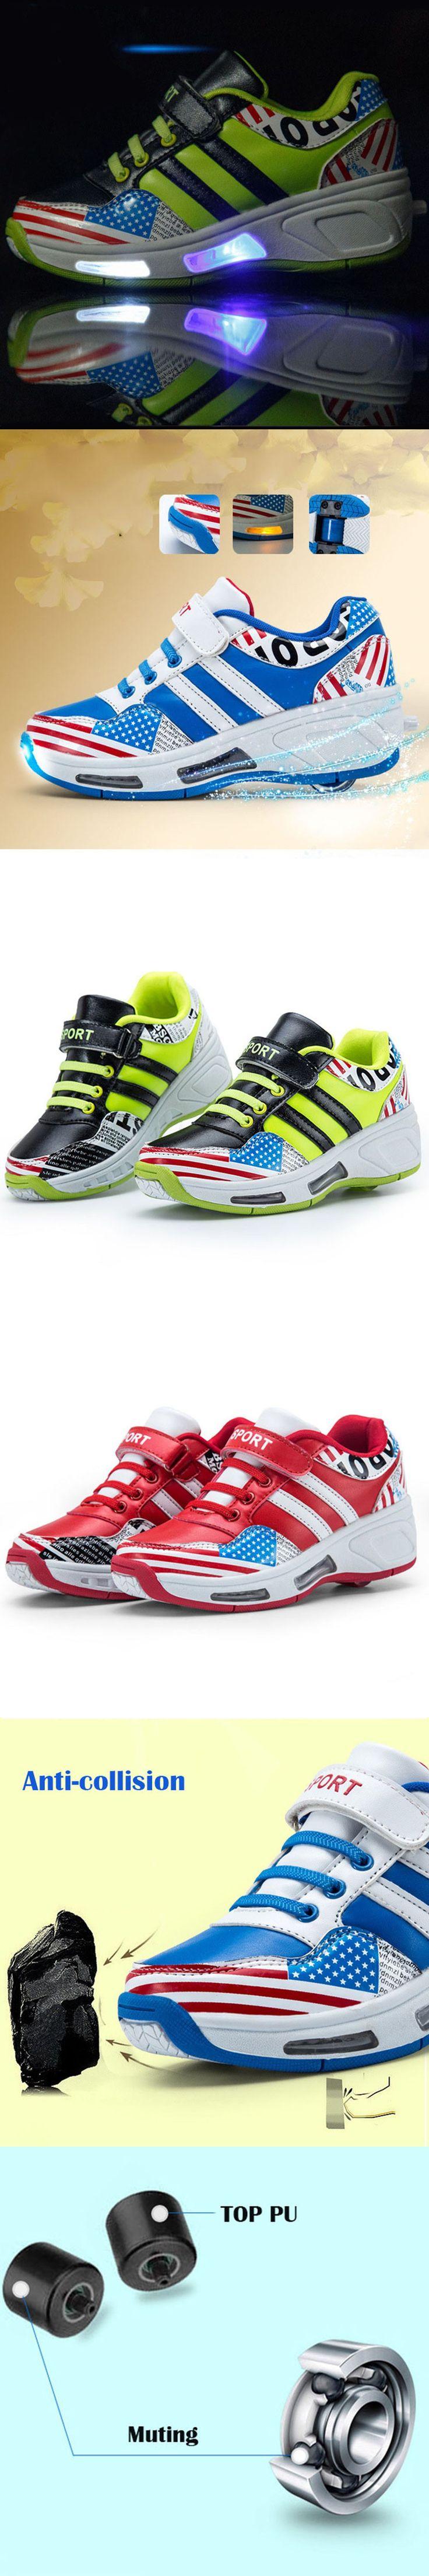 Led Light Heelys Children Shoes with Wheels Kids Roller Shoes Sneakers for Boys Girls Sneaker tenis infantil chaussure enfant